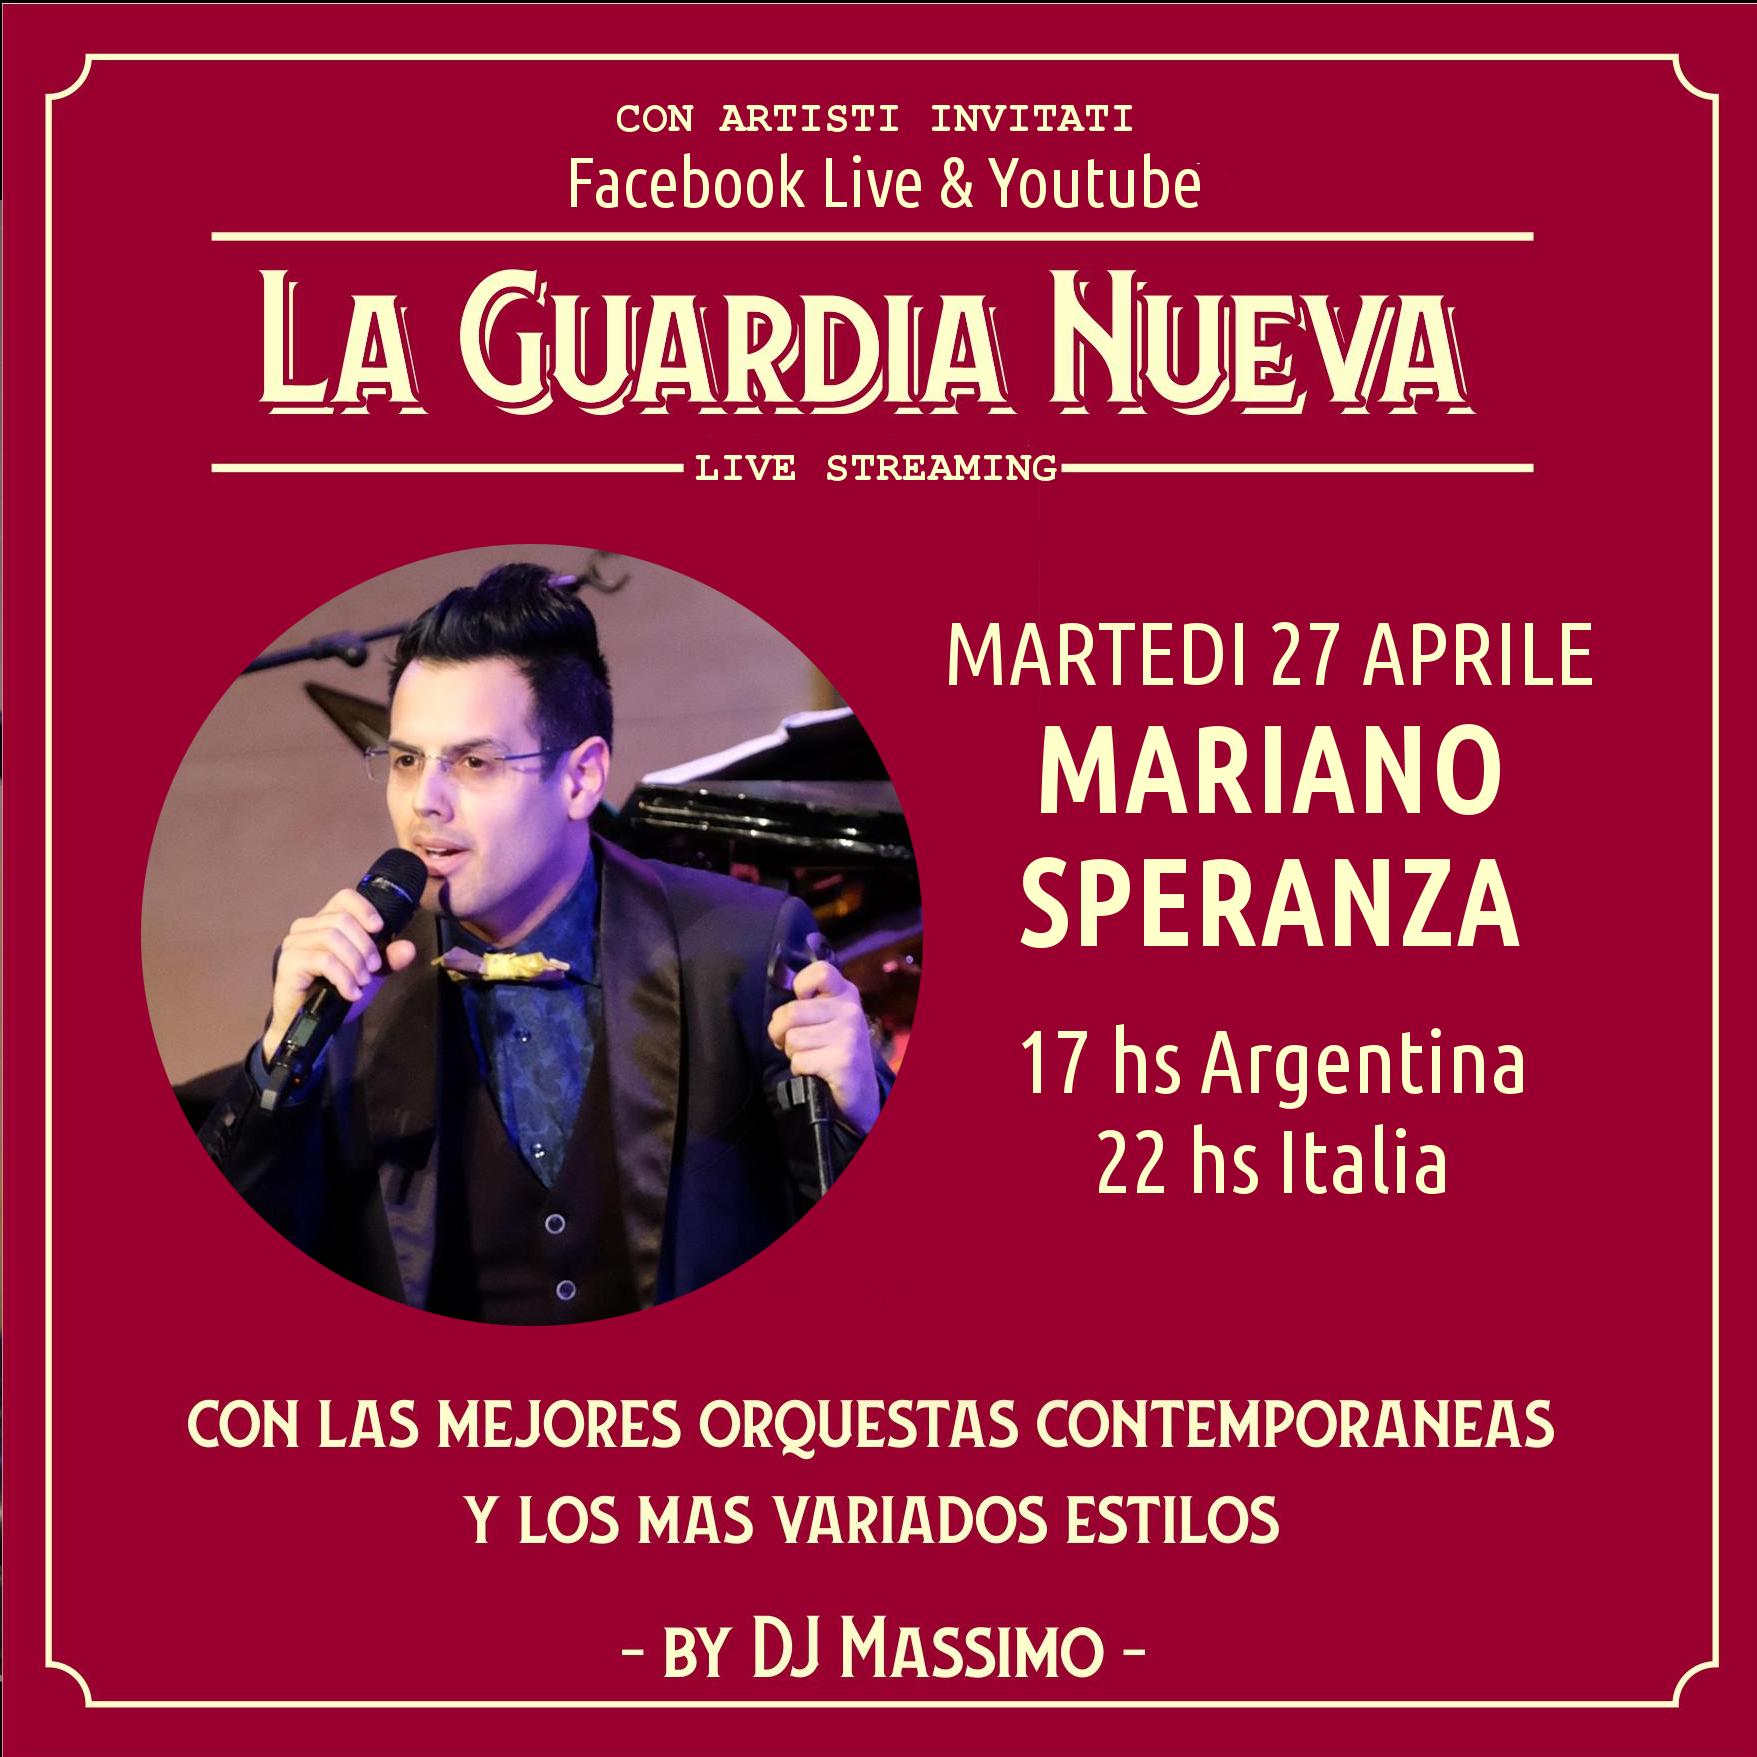 la guardia nueva tango del siglo xxi Martes 27 Abril